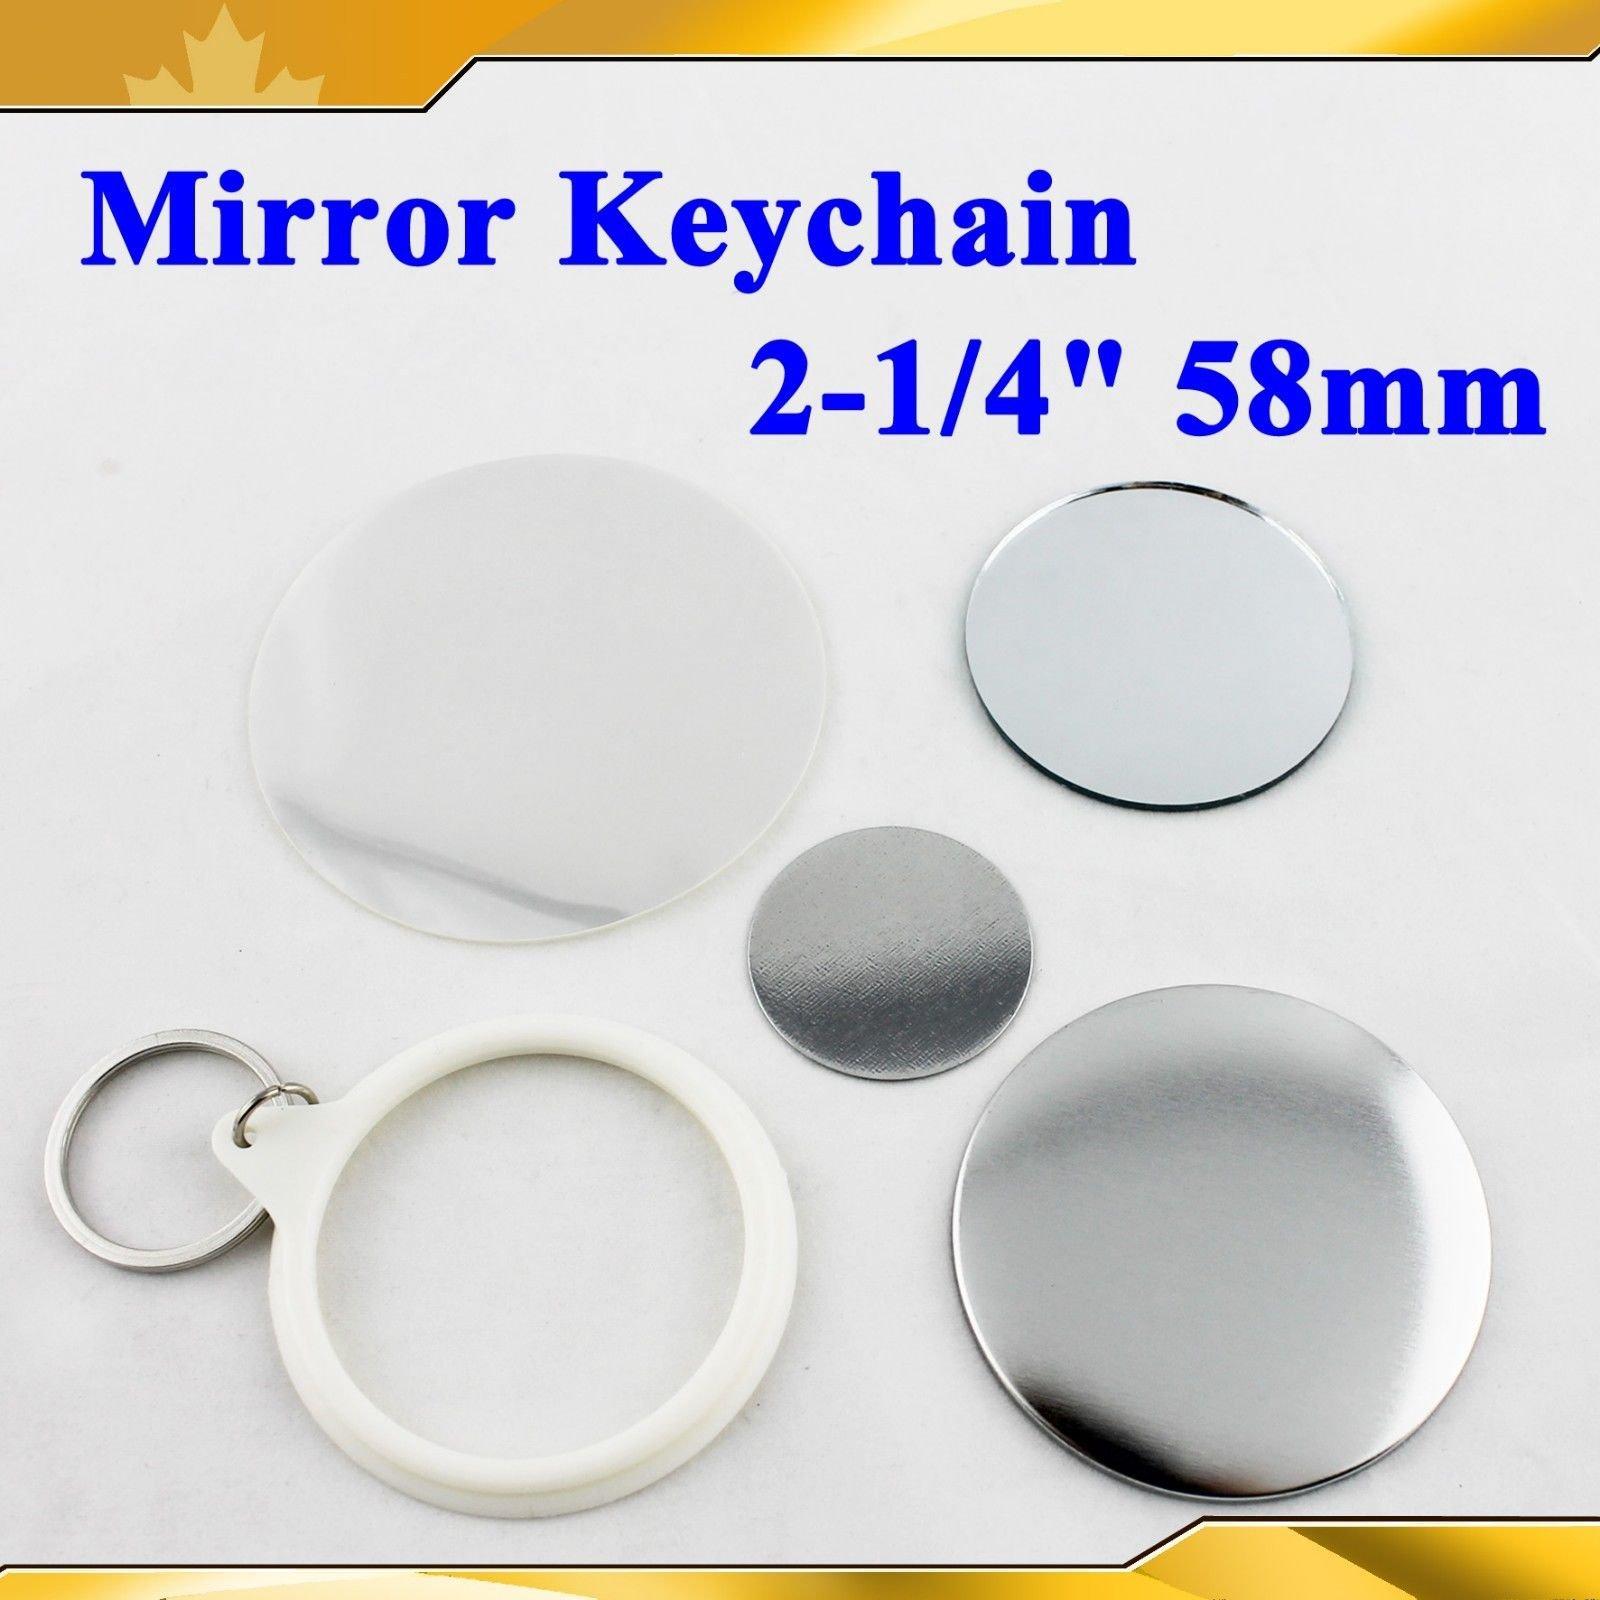 Mirror Keychain 58mm 2-1/4'' Supplies 100sets for Pro Maker Machine Commerciadiy